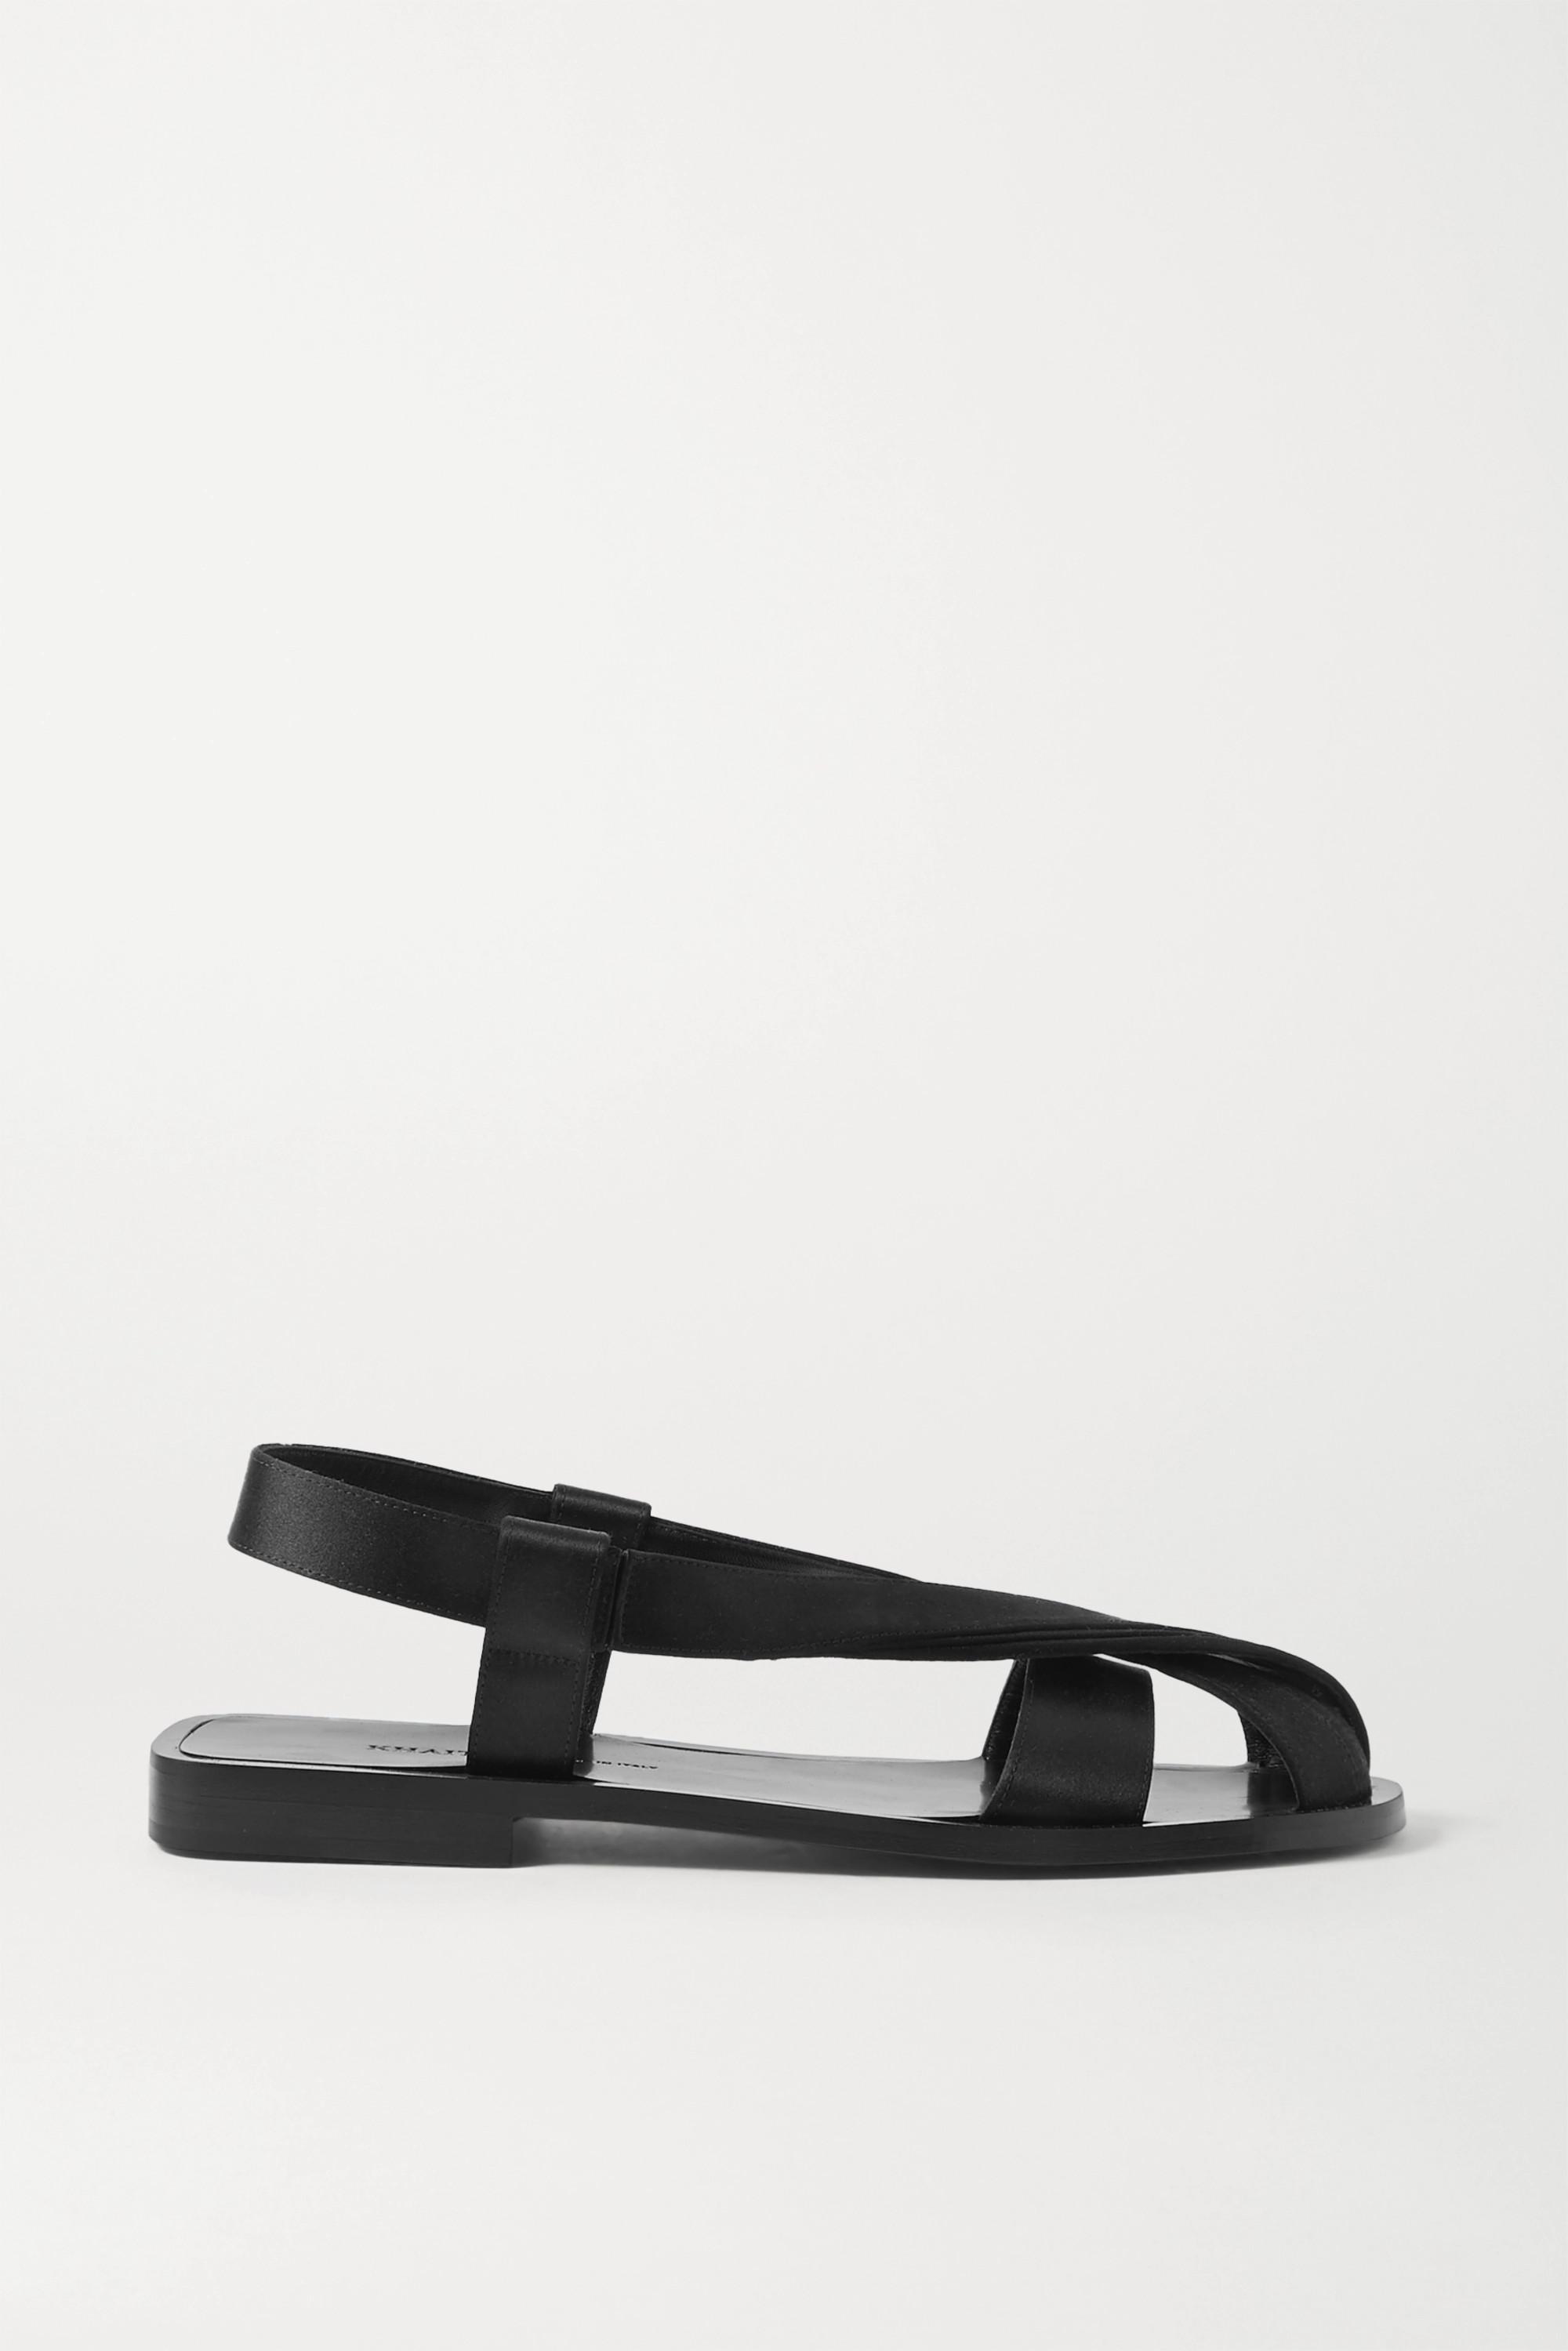 Khaite Slingback-Sandalen aus Satin